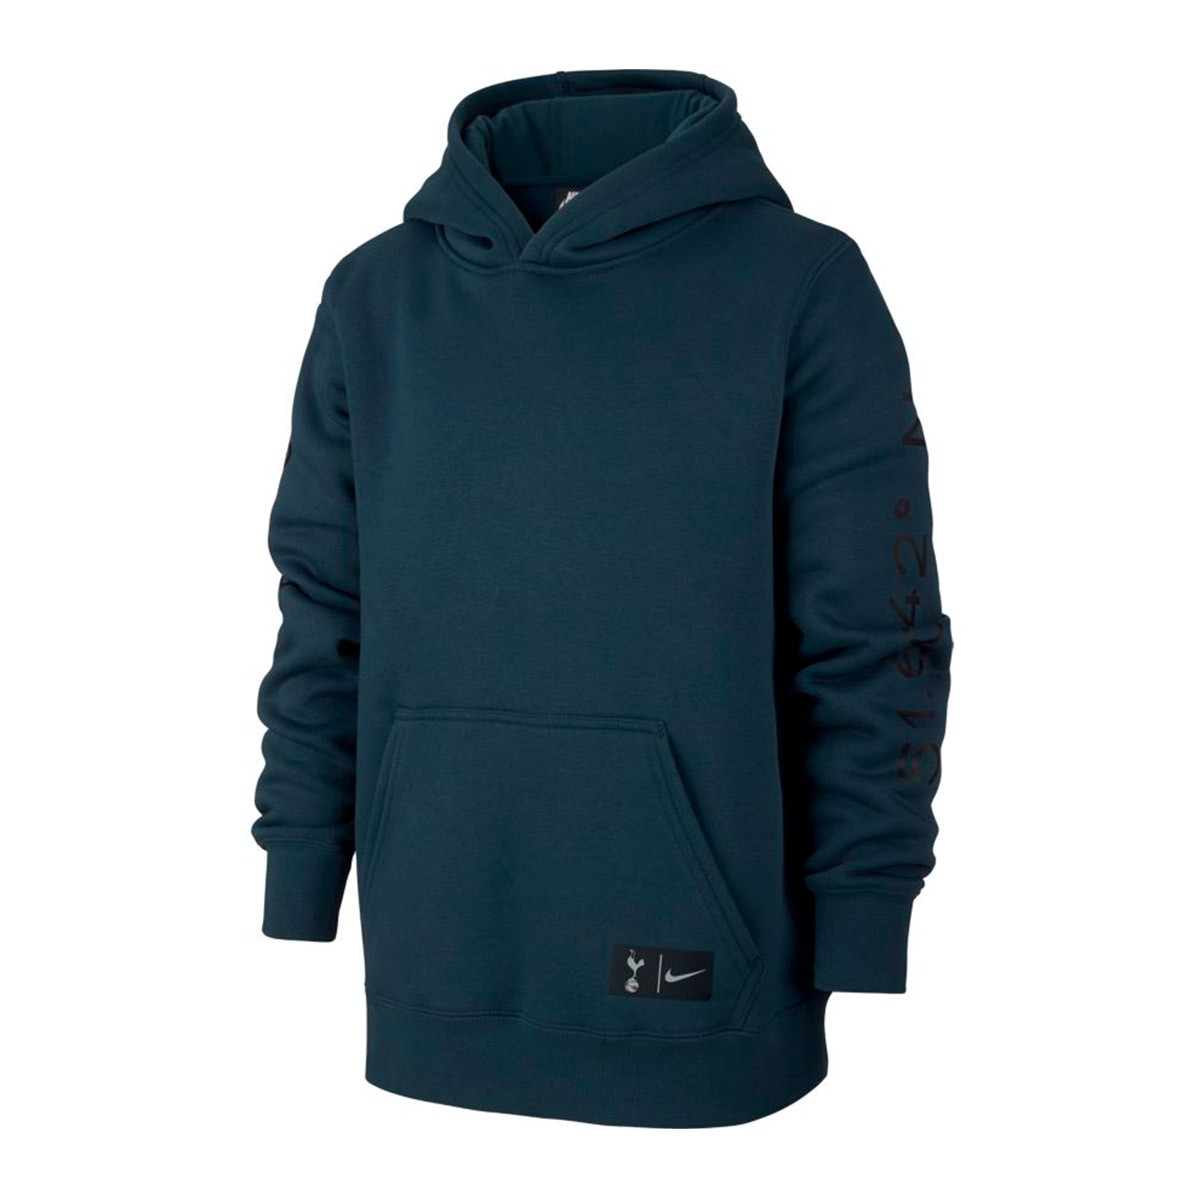 57596445f Nike Kids Tottenham Hotspur FC 2018-2019 Sweatshirt. Armory navy-Black ...